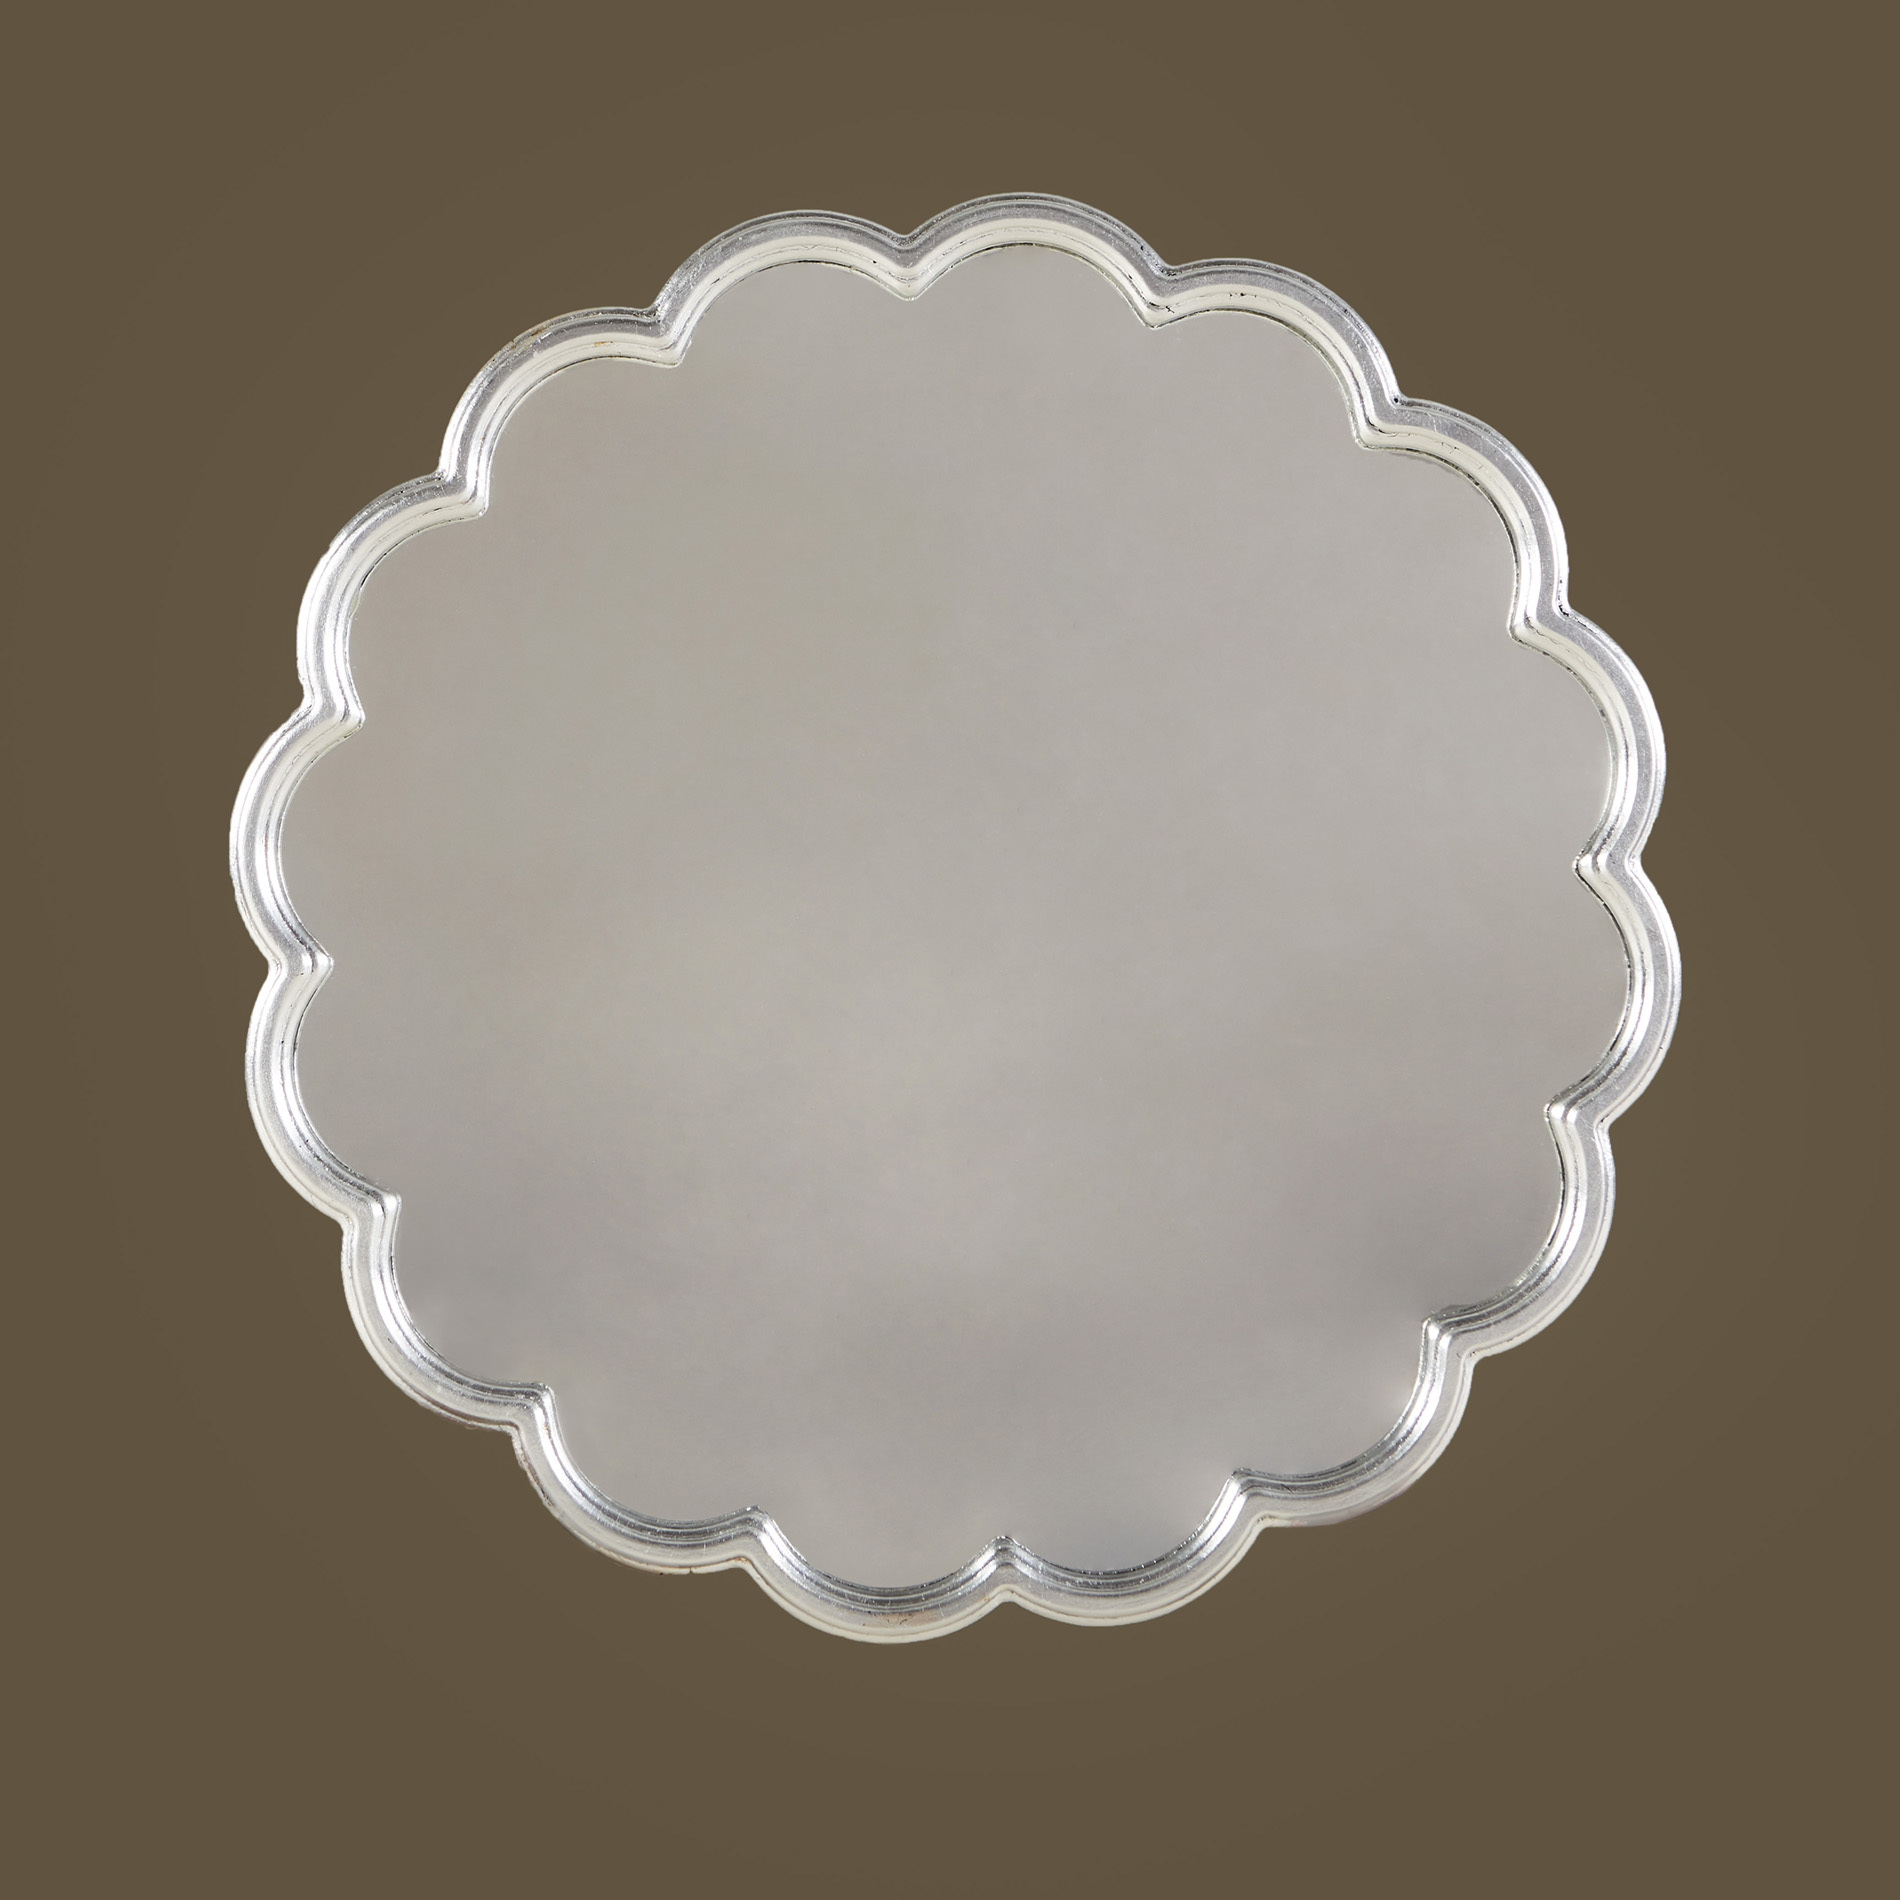 Silver Flower Mirror 0136 V1